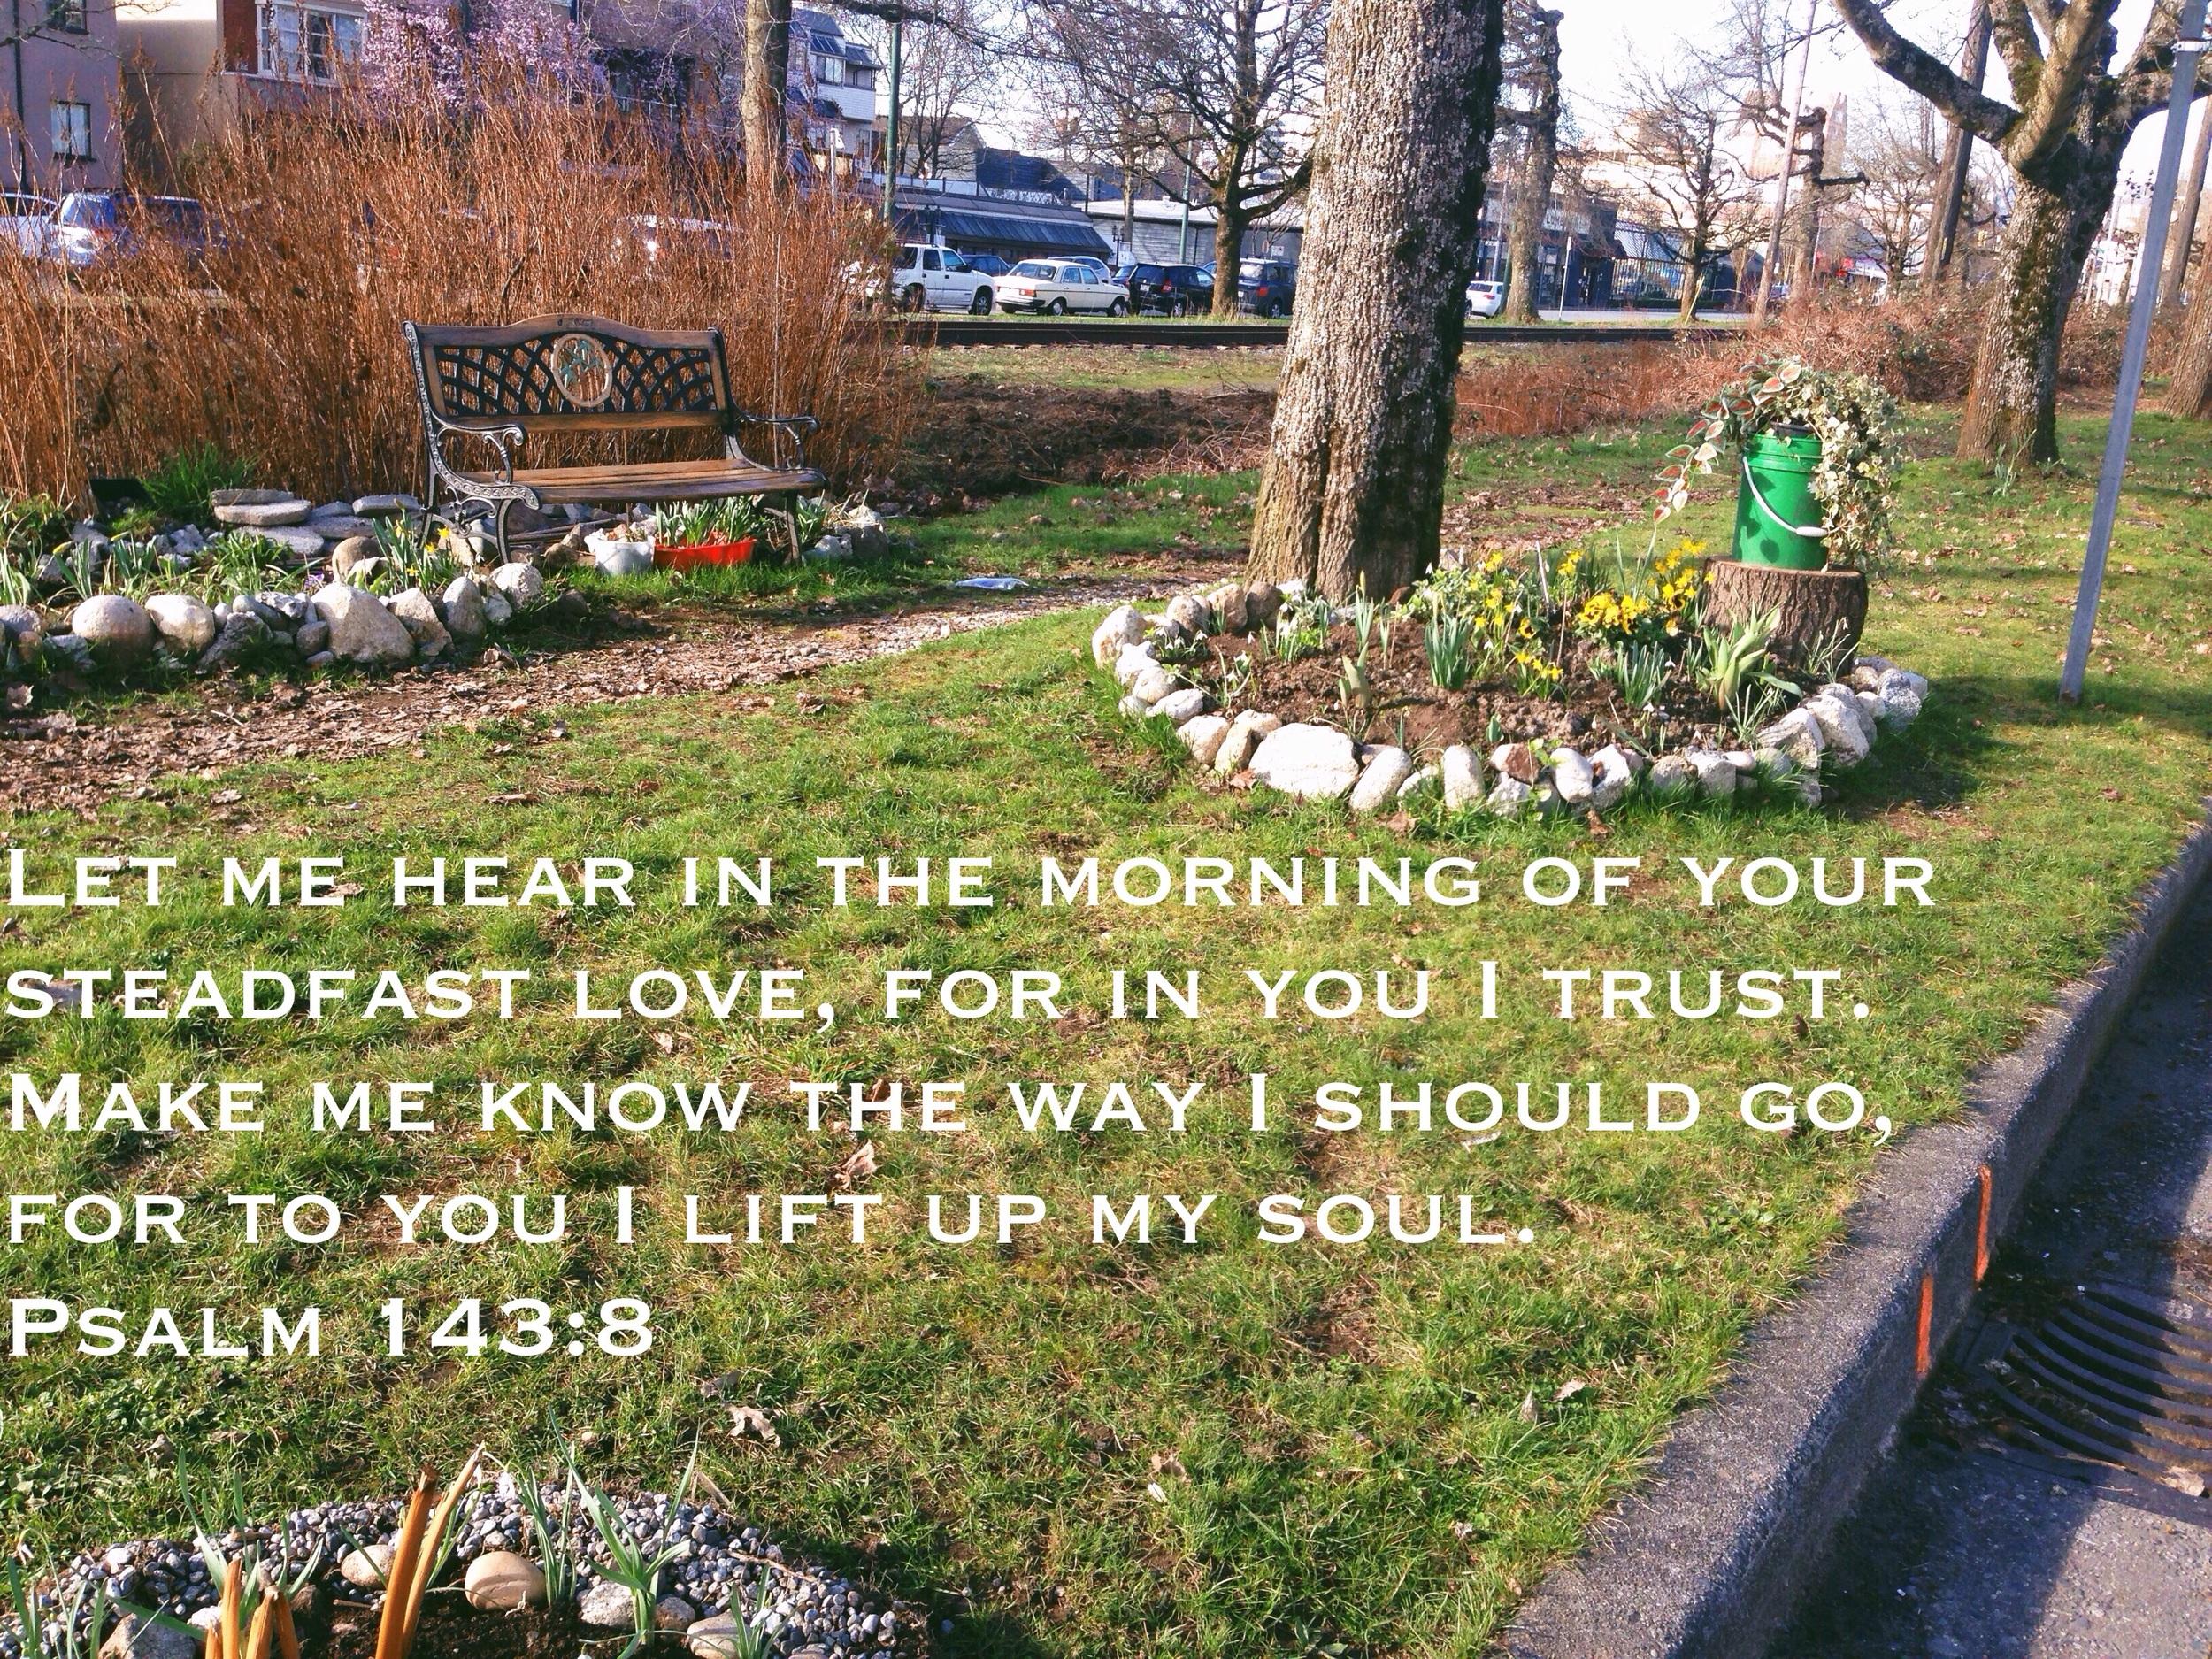 Psalm 143 via nadinewouldsay